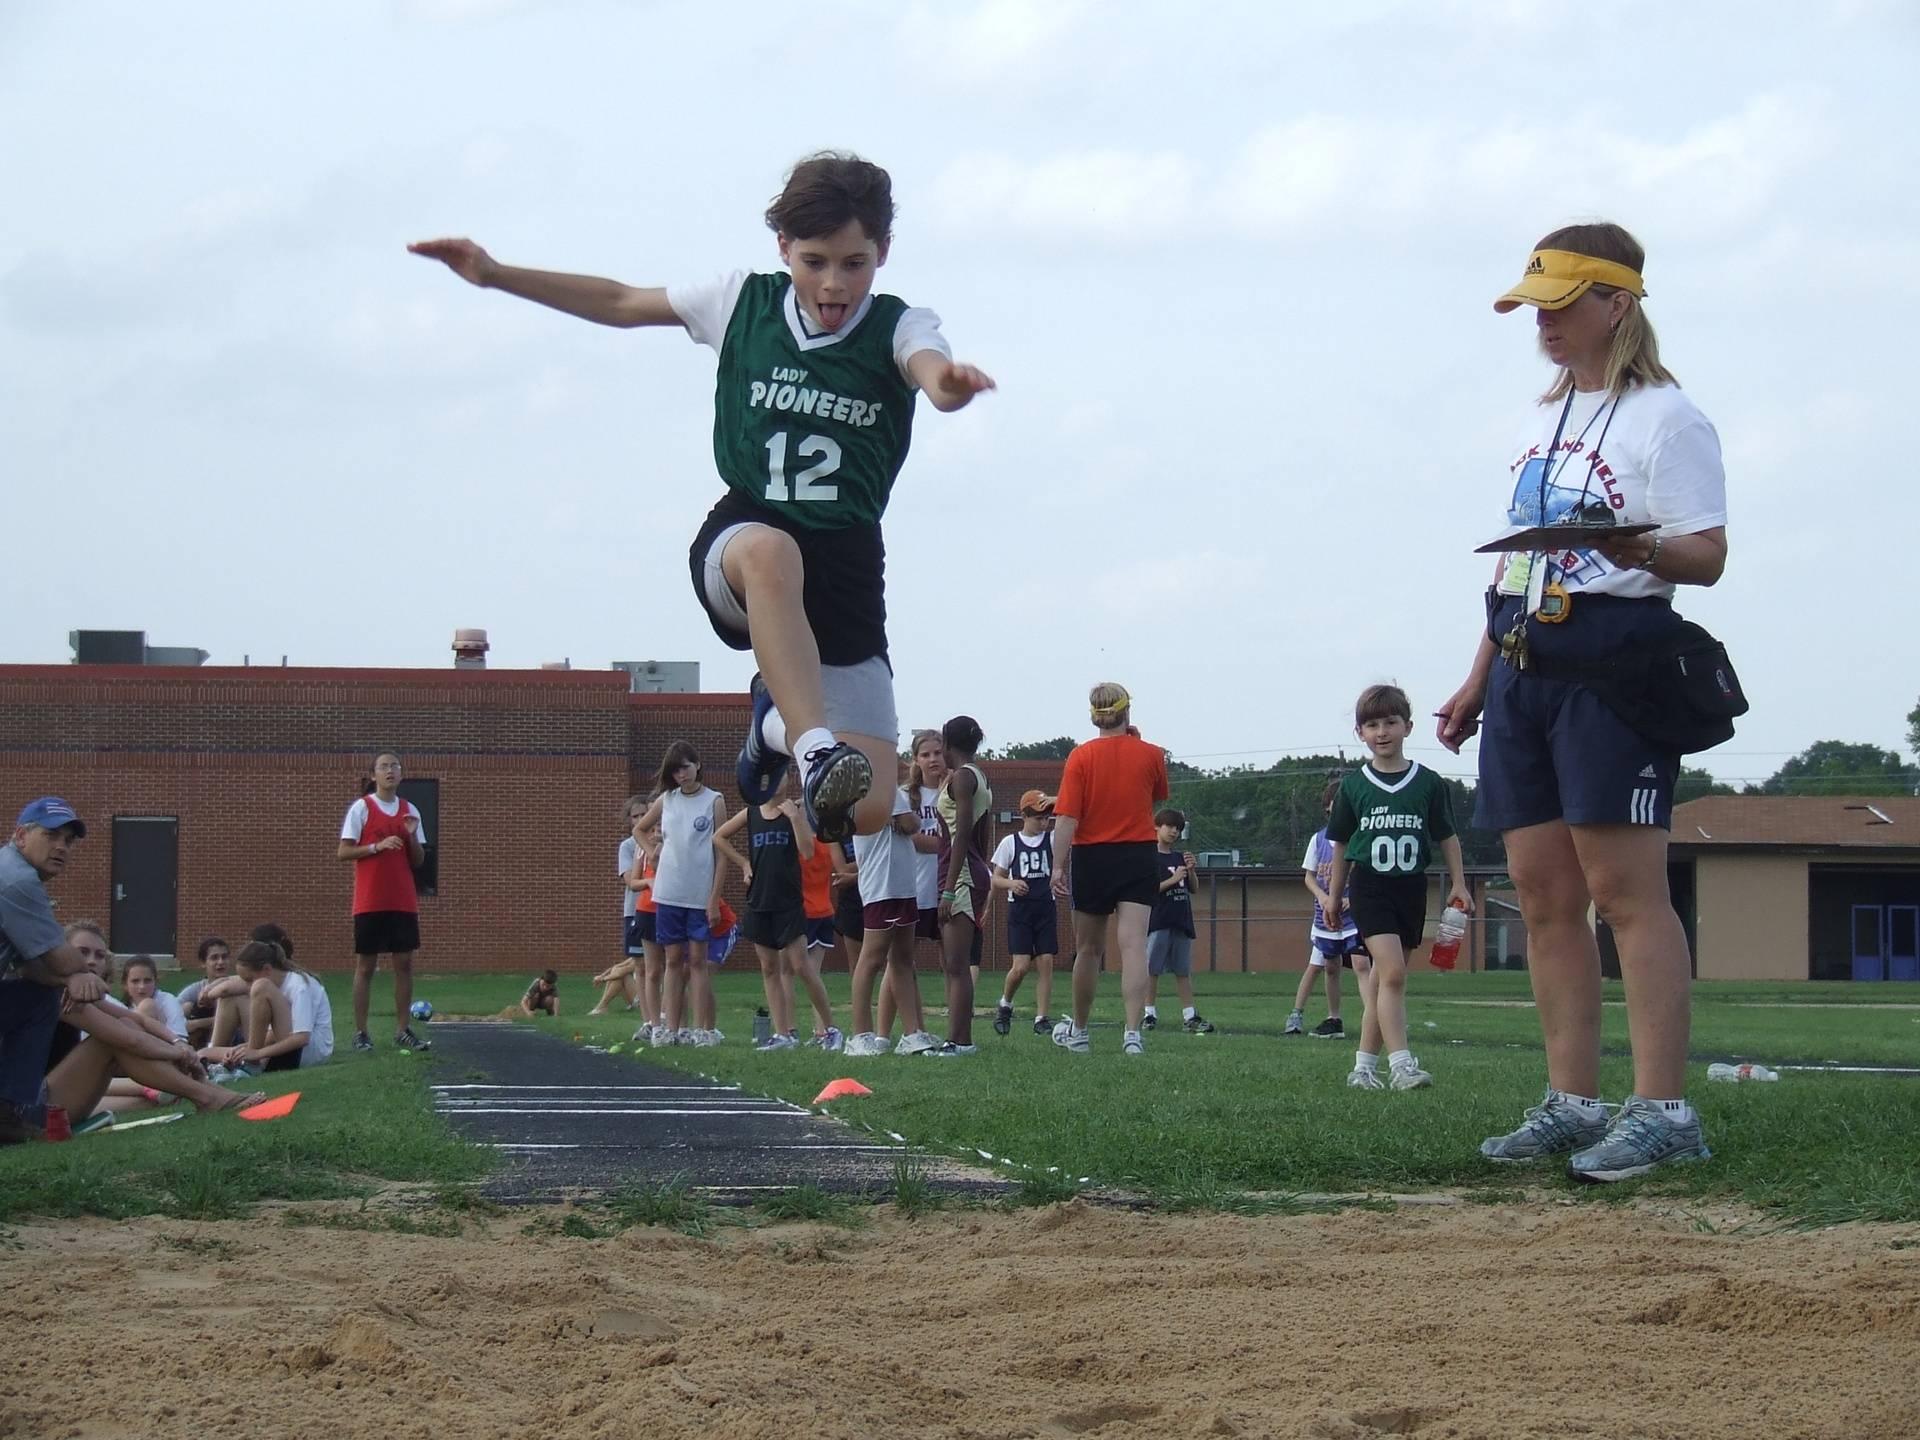 Elementary Track & Field